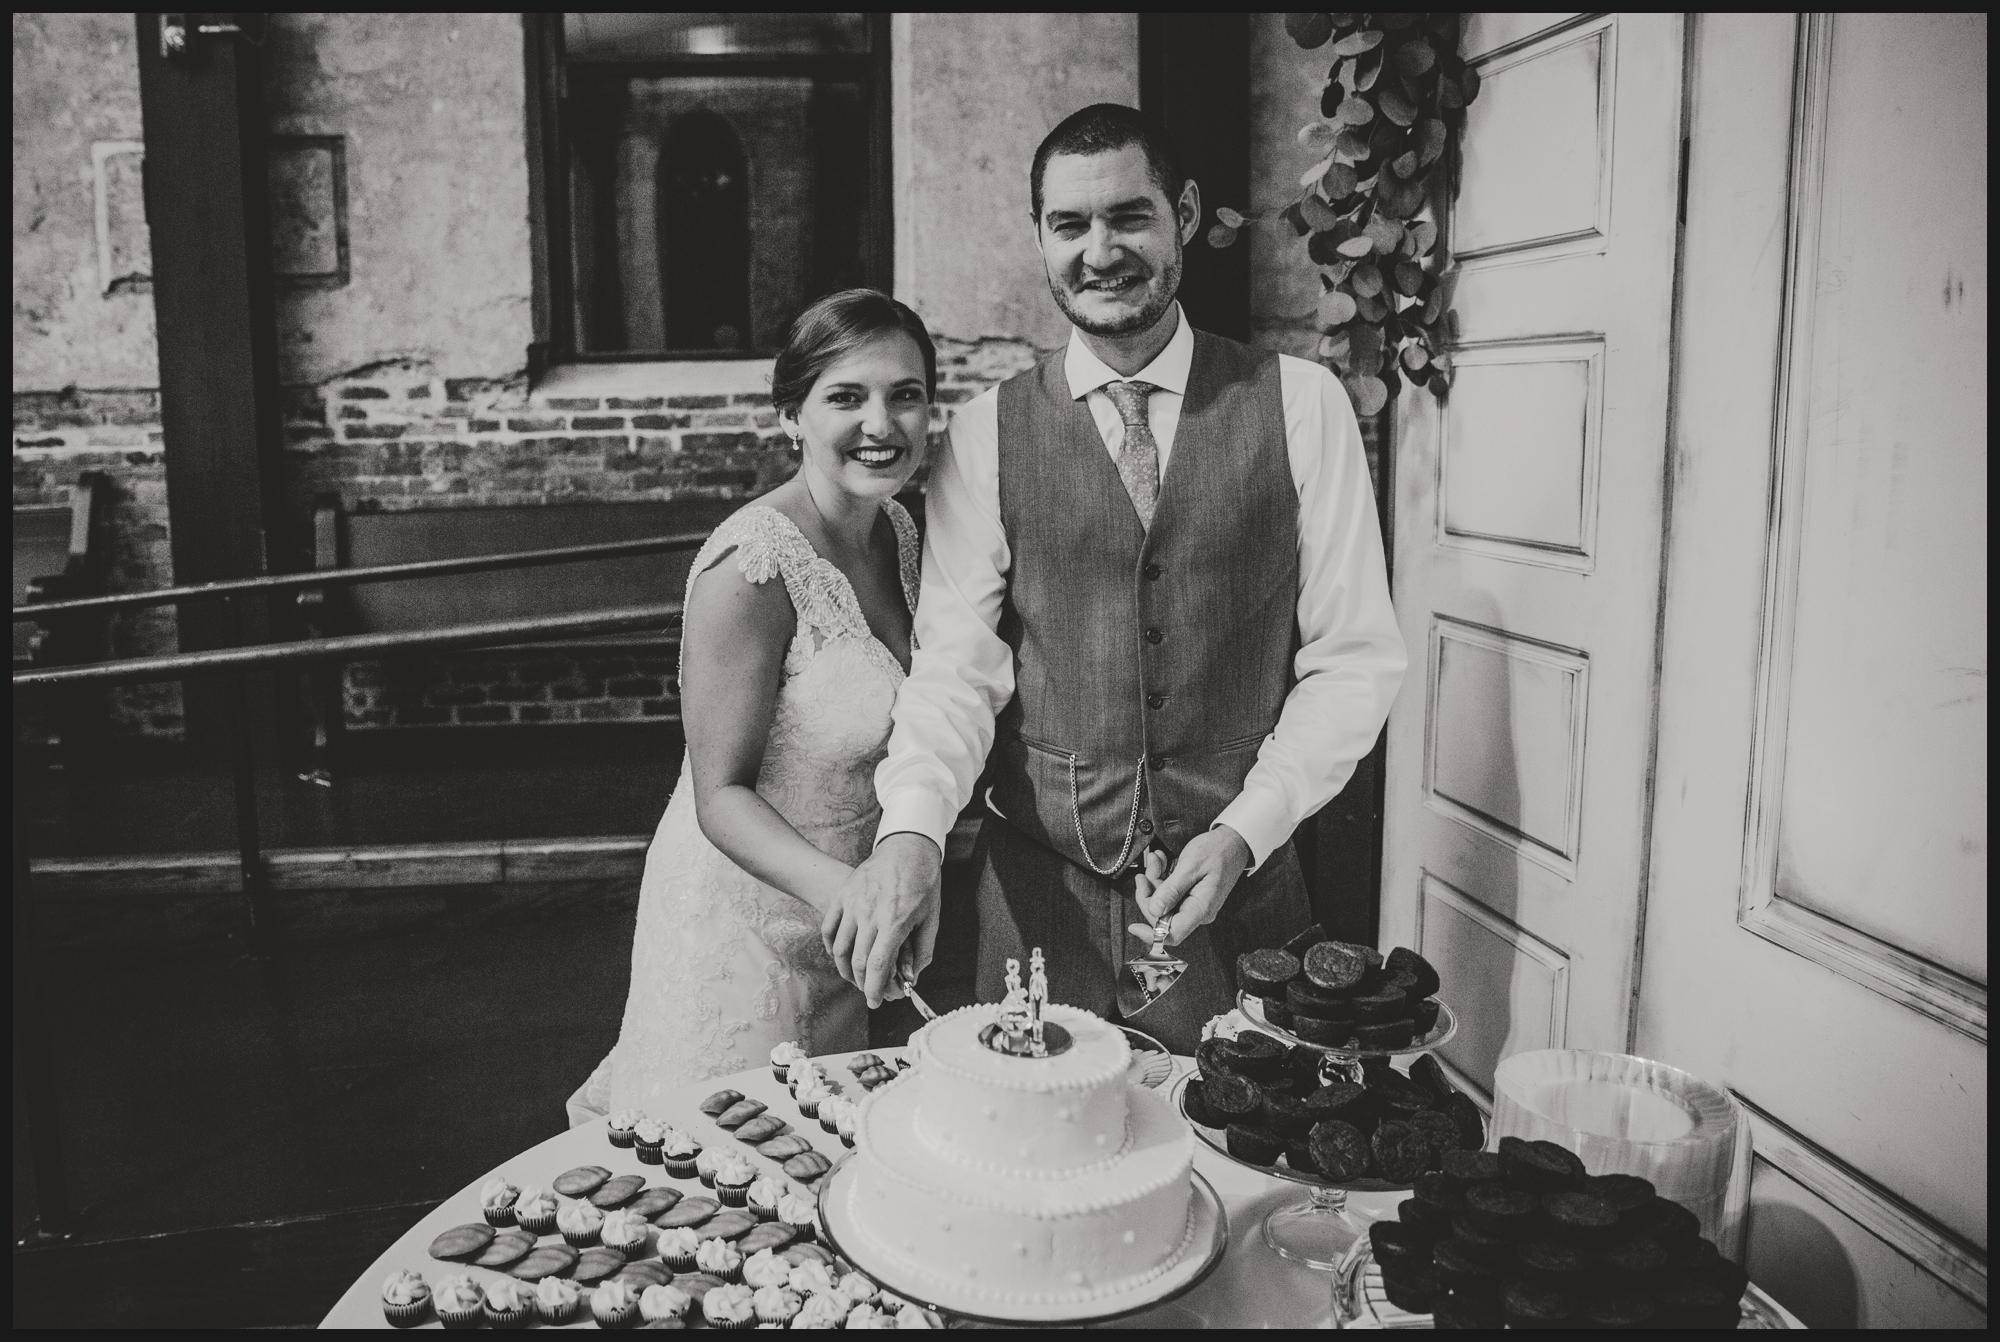 Orlando-Wedding-Photographer-destination-wedding-photographer-florida-wedding-photographer-bohemian-wedding-photographer_0652.jpg